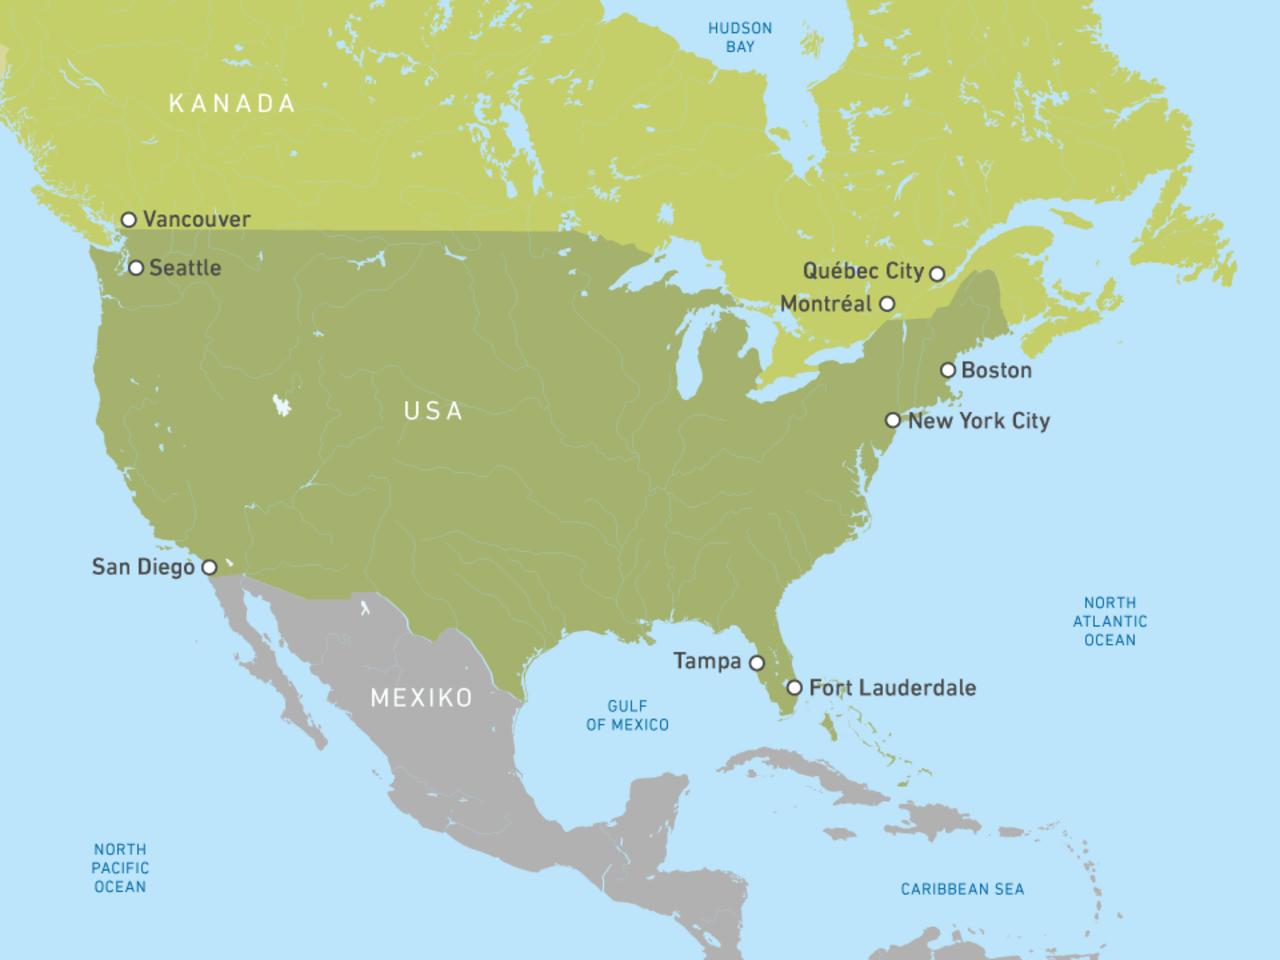 Holland America Line: Kreuzfahrten zu traumhaften Zielen   CANUSA